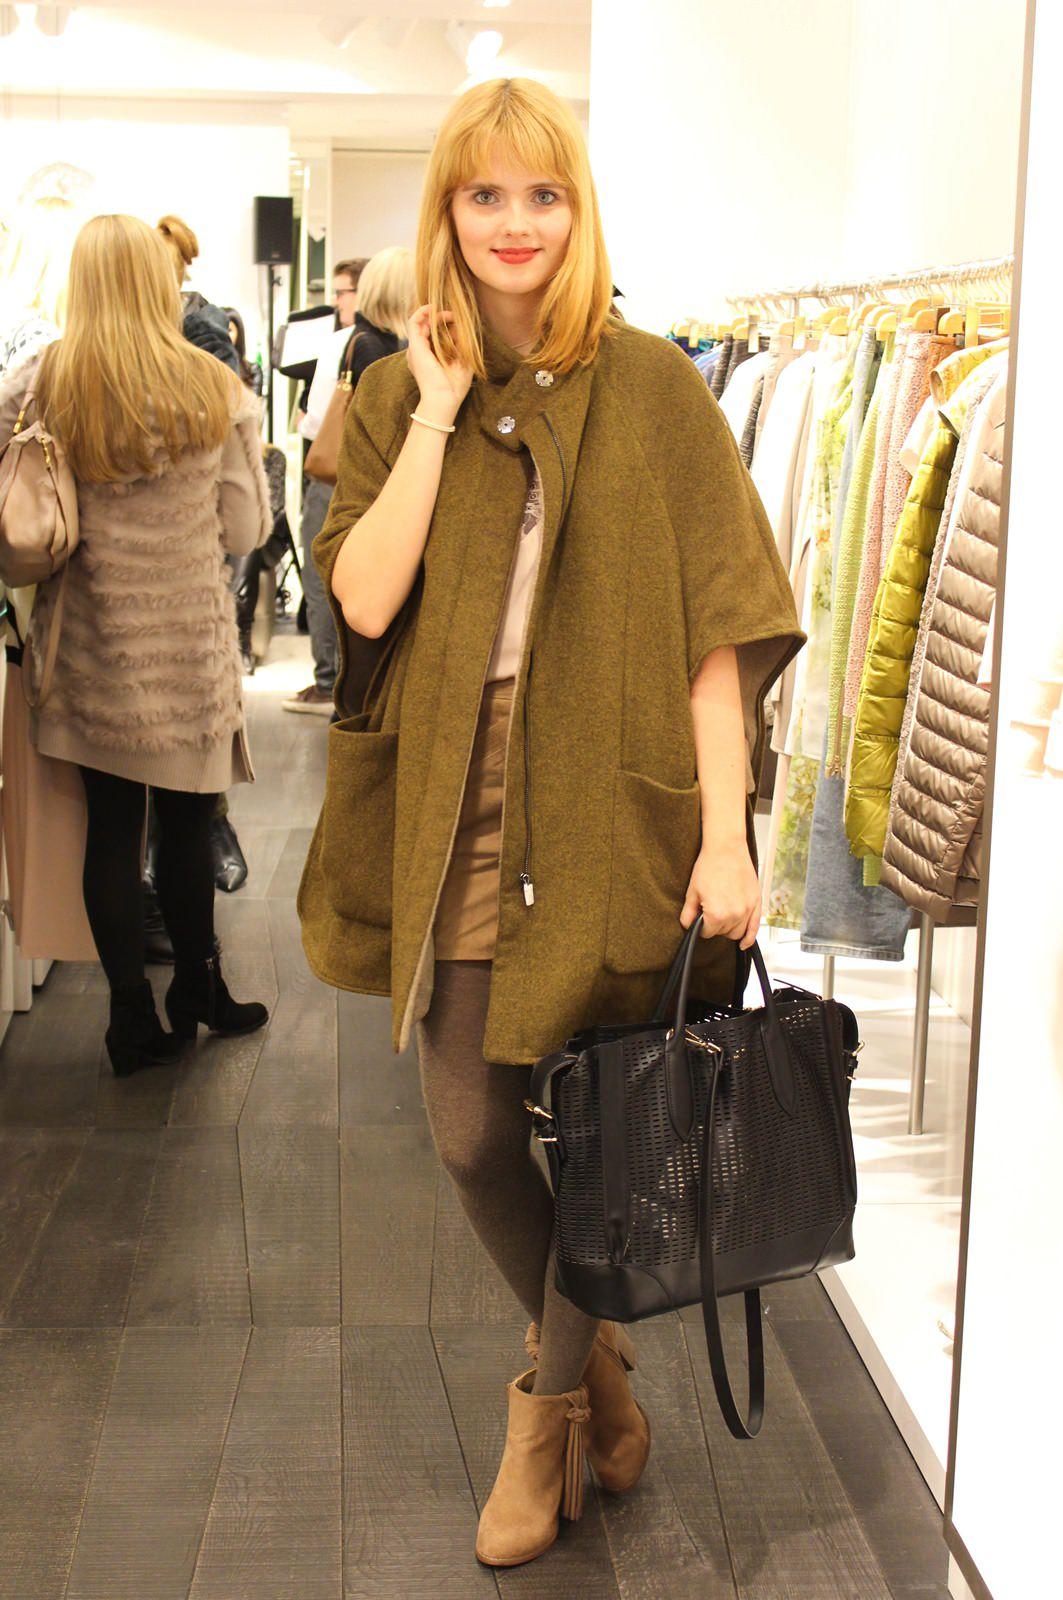 Mein Outfit- Cape: Zara (Sale, aktuell) / Top: H&M / Rock: Mango / Boots: Forever 21 (aktuell) / Tasche: Zara